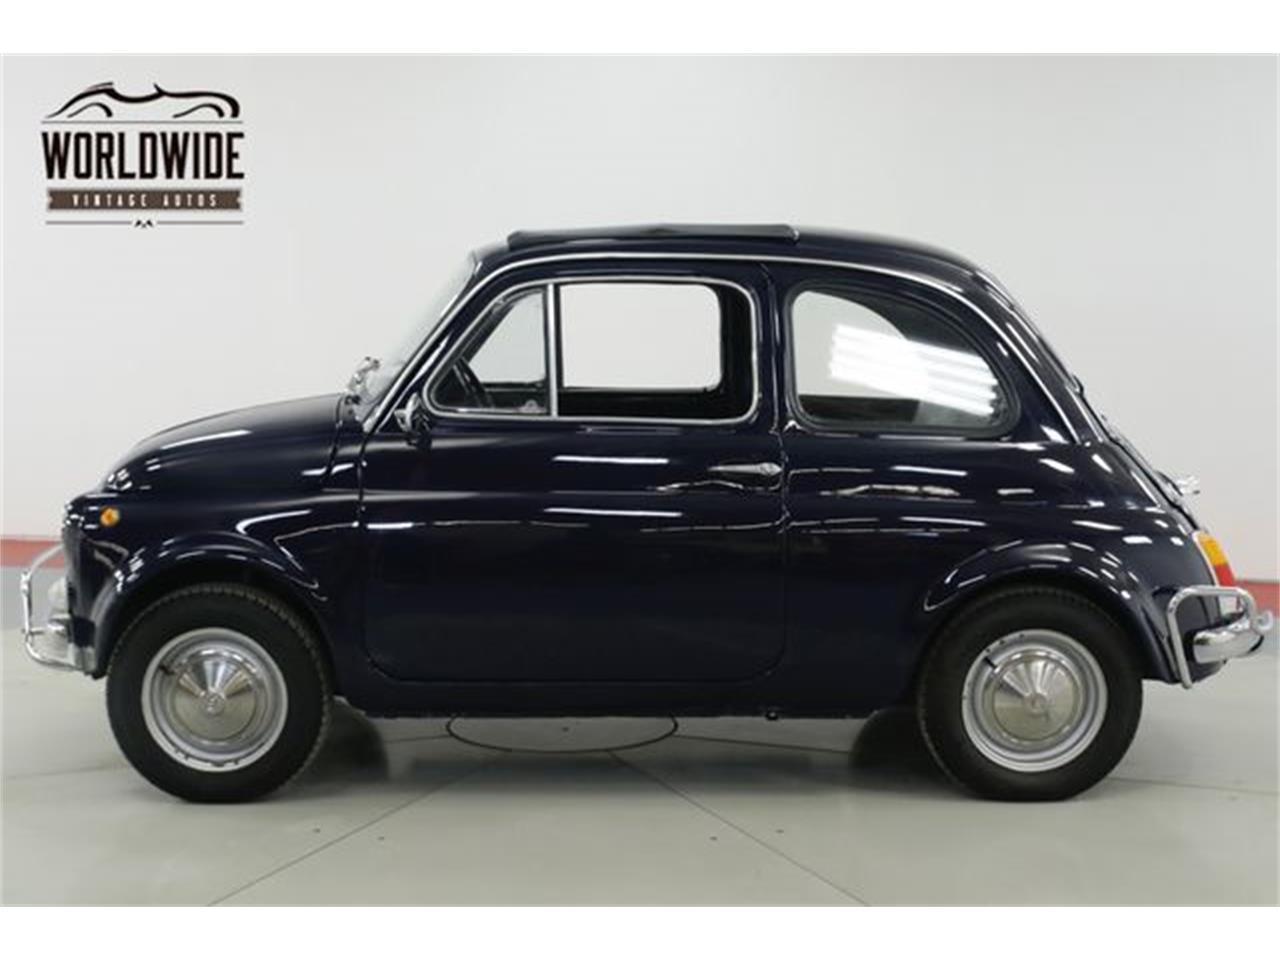 Large Picture of '71 Fiat 500L - $15,900.00 - Q40U